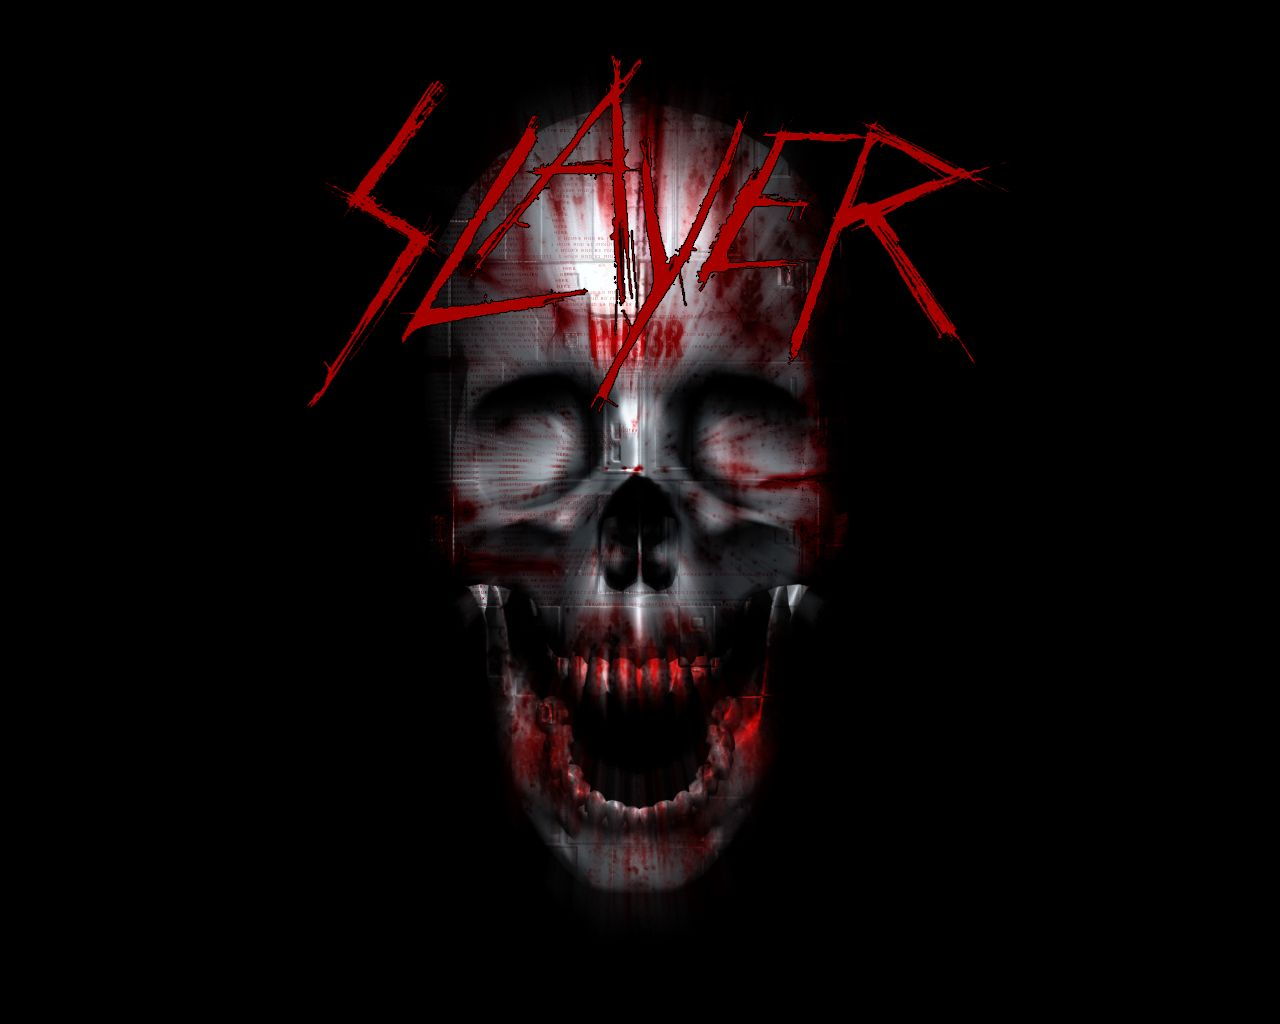 Slayer Wallpaper HD file name slayer wallpaper posted